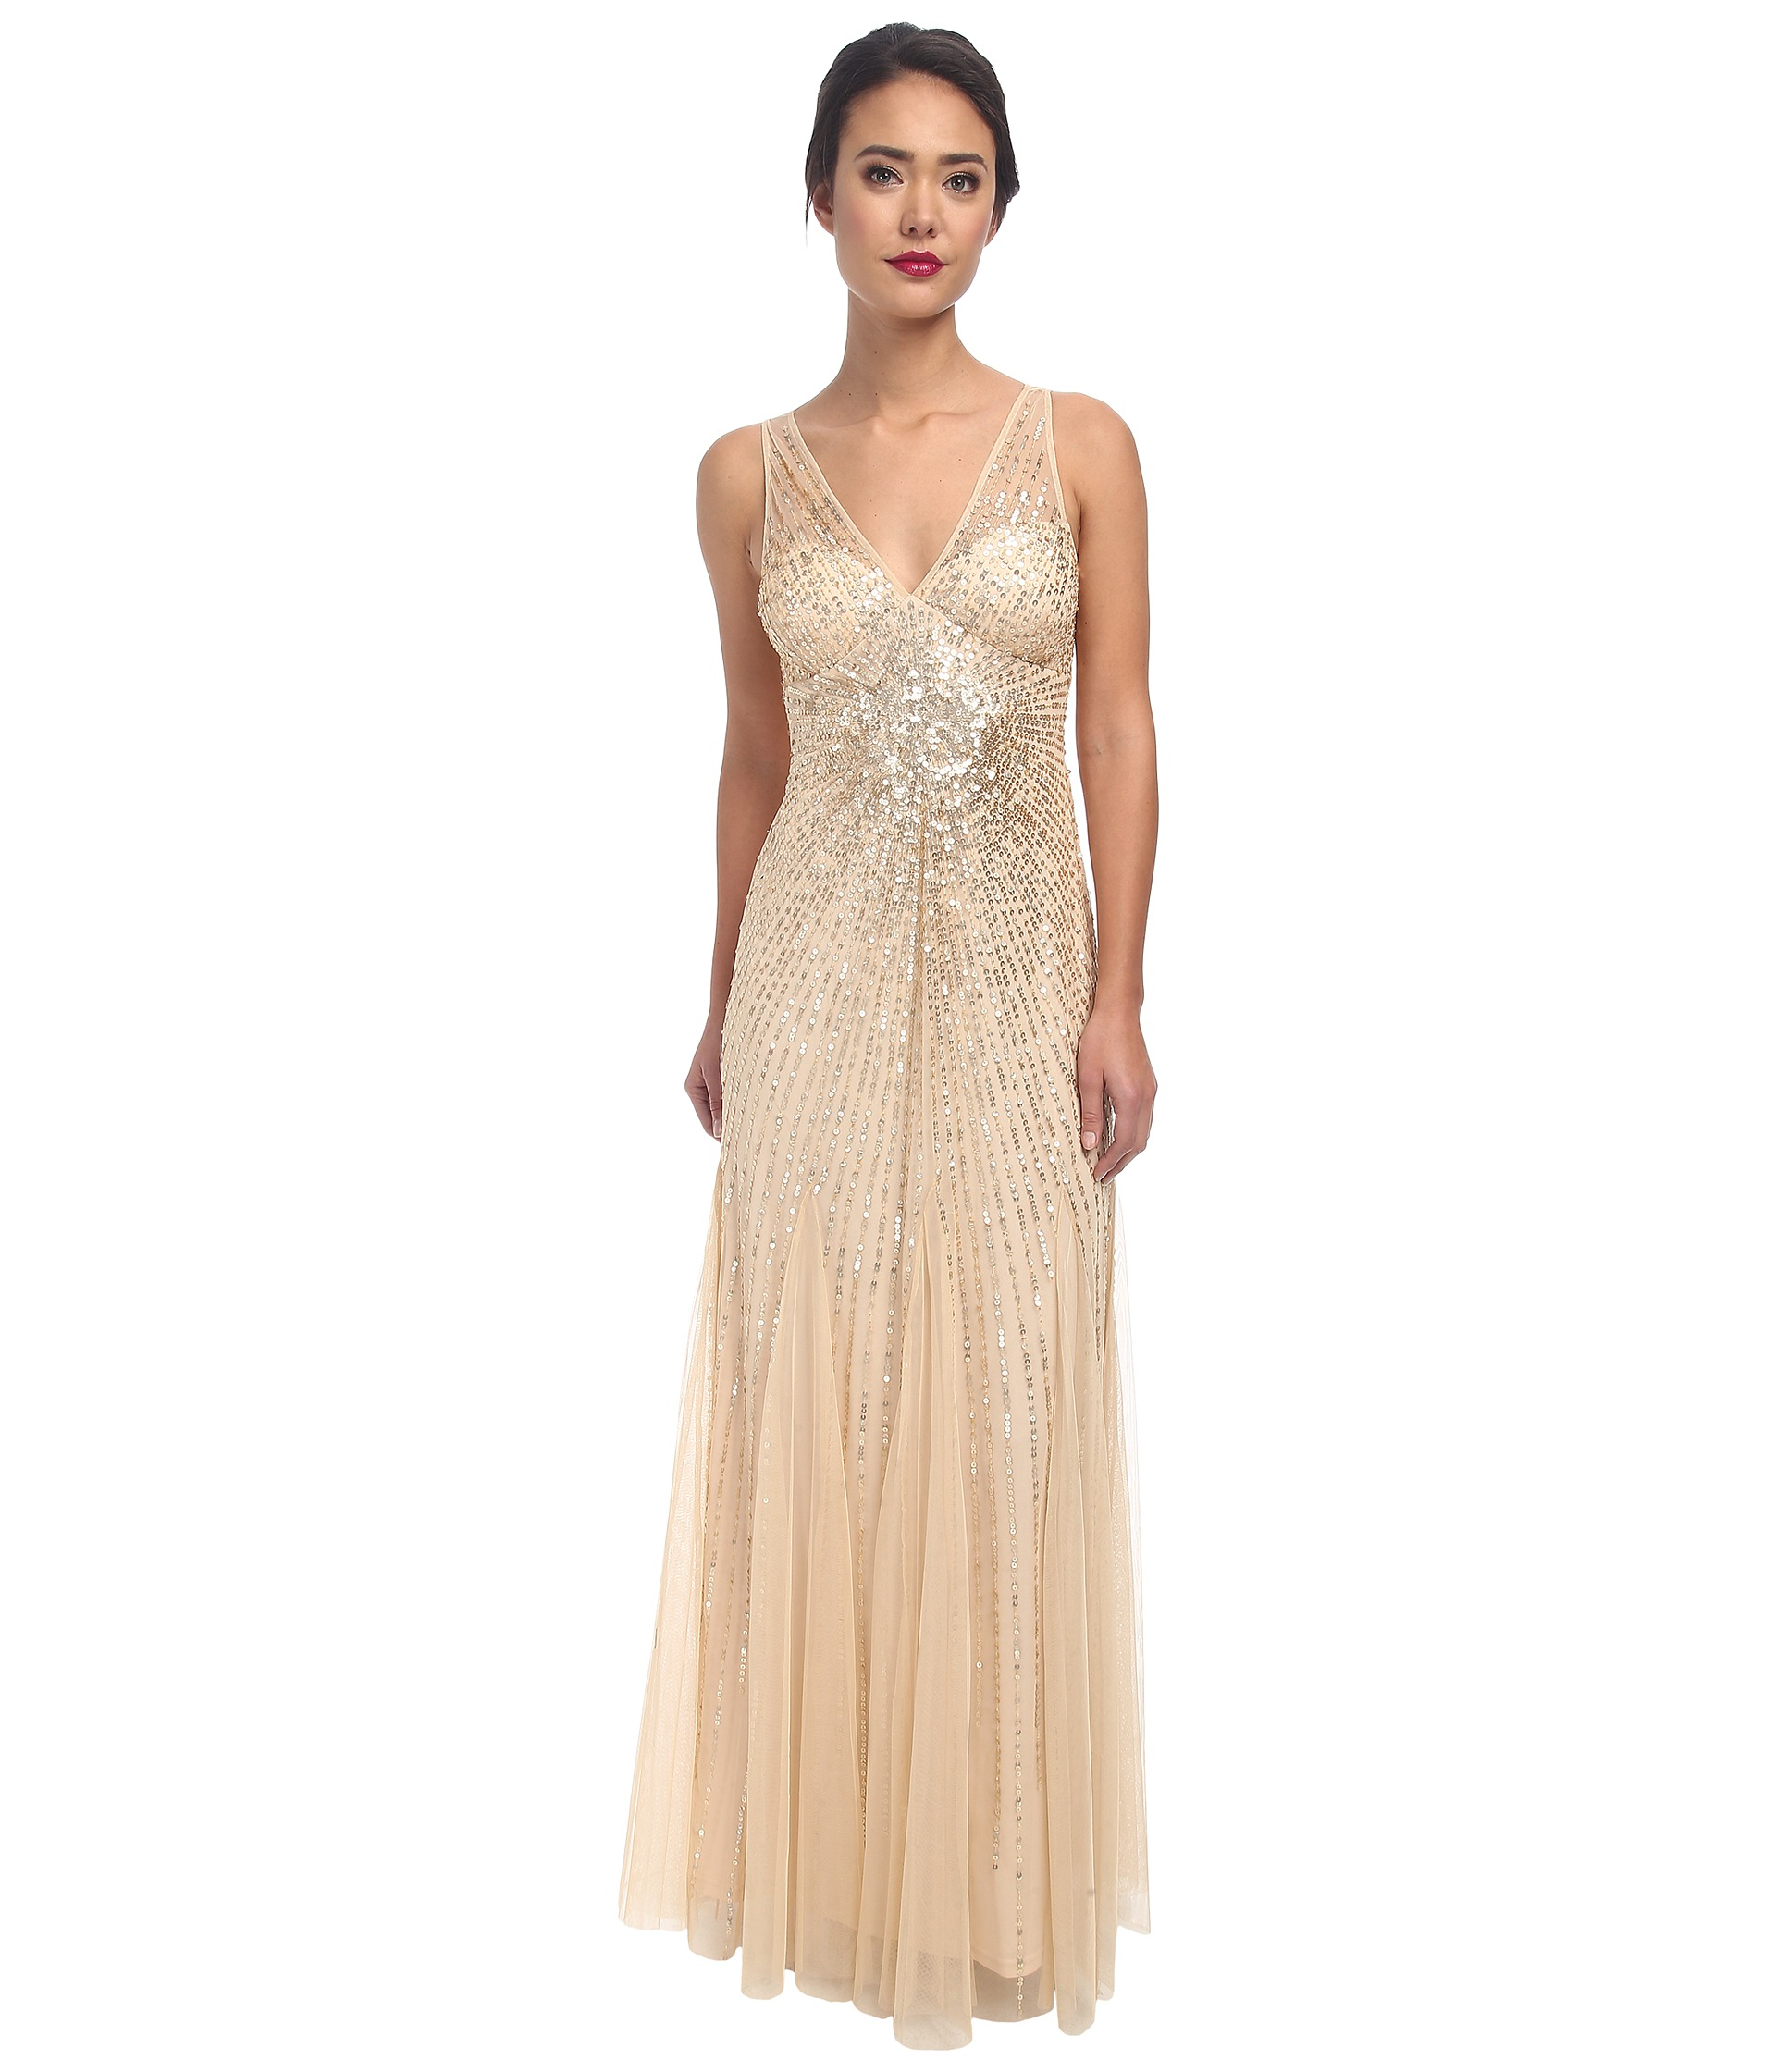 424fb9dc7961 Lyst - Adrianna Papell Beaded Mesh Mermaid Gown in Metallic